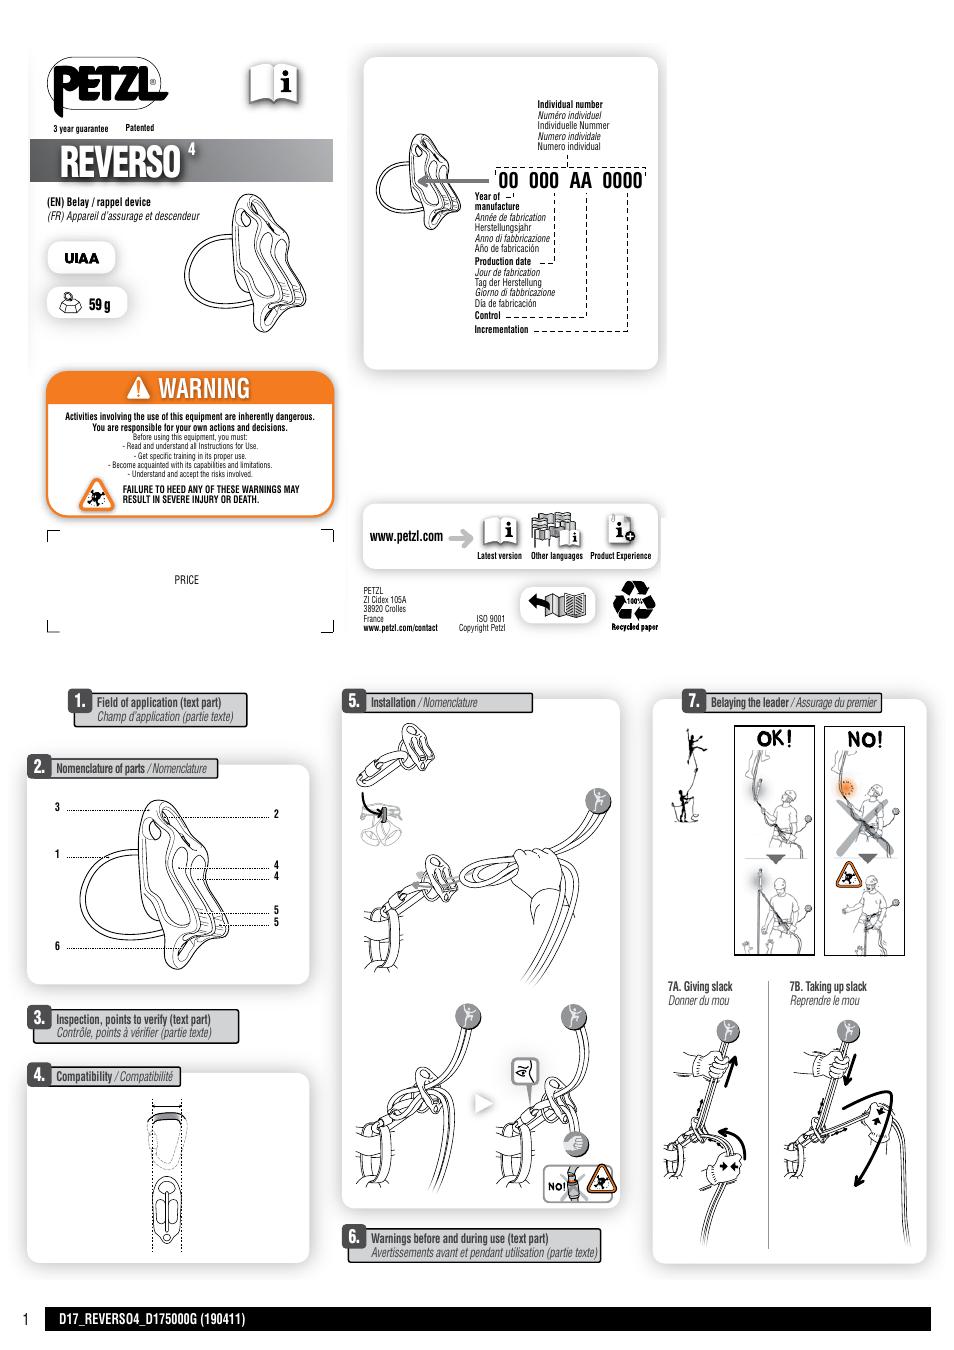 petzl reverso 4 instructions